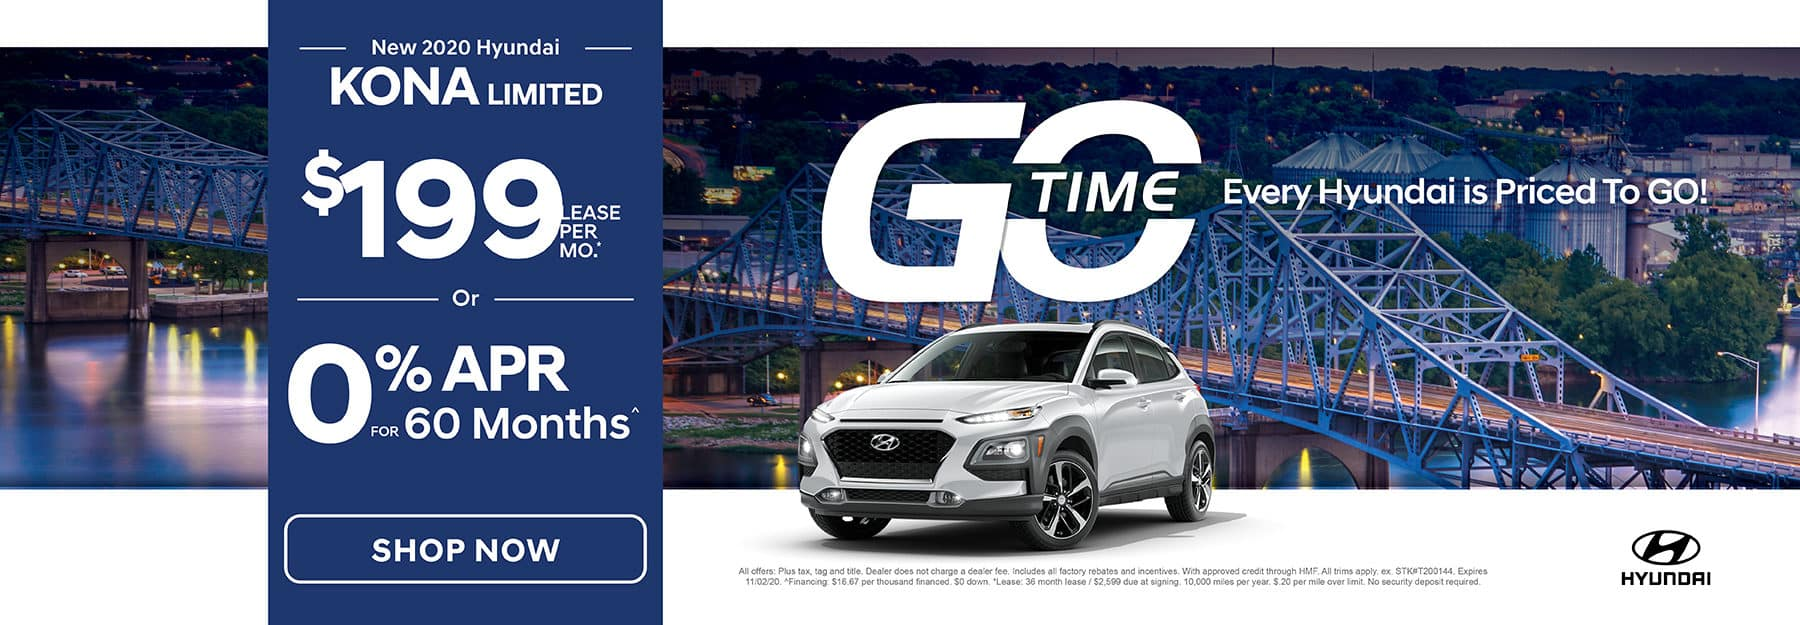 GO TIME - New 2020 Hyundai Kona